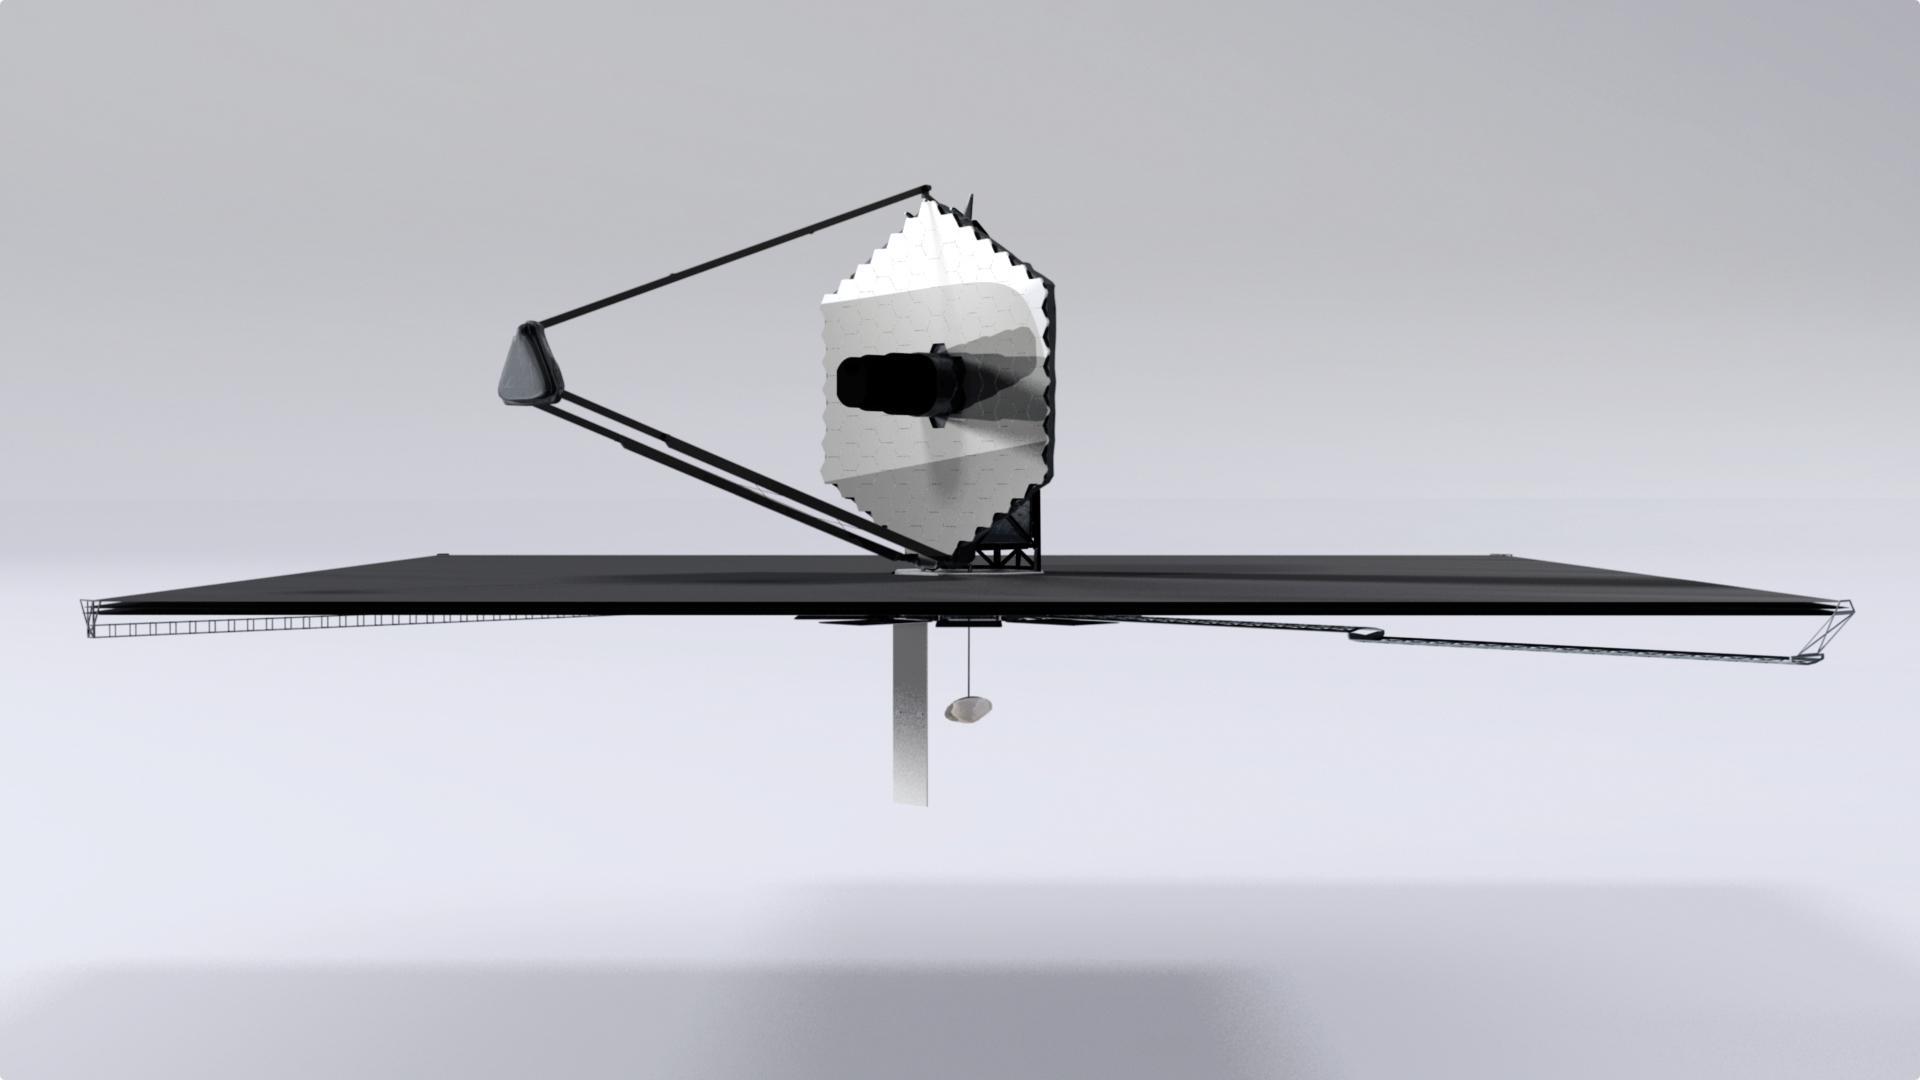 LUVOIR space telescope 15m concept (NASA)